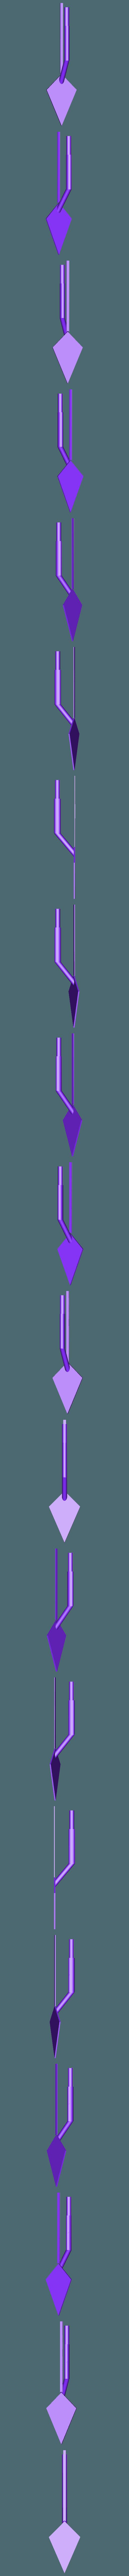 plumaspatula3.stl Download free STL file Pen - Palette Knife • Model to 3D print, FenixYeshua